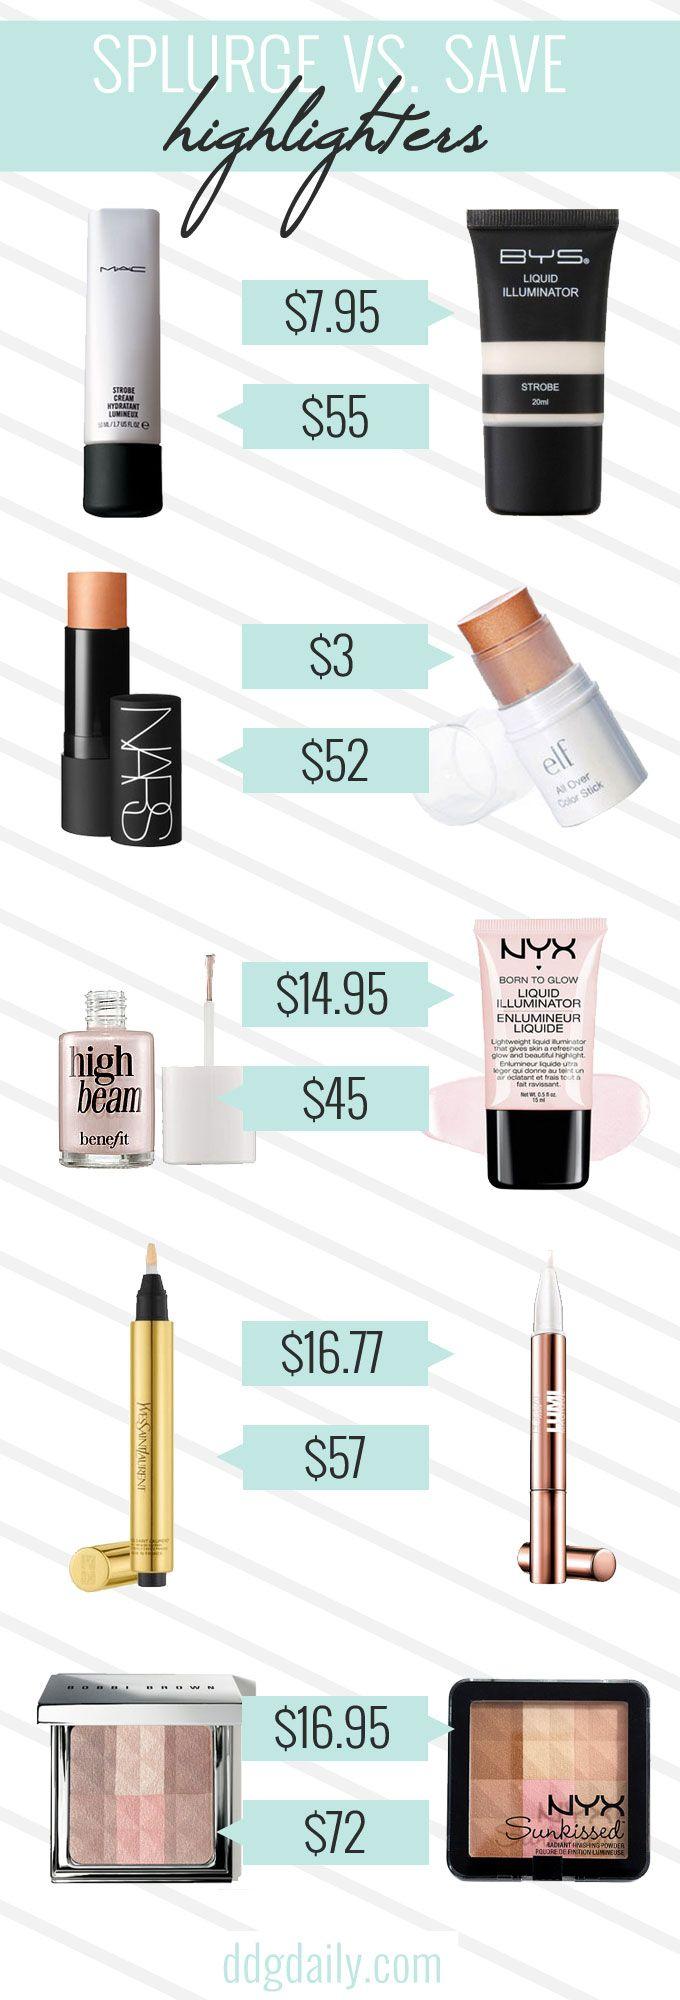 Best beauty dupes: Splurge vs save highlighters